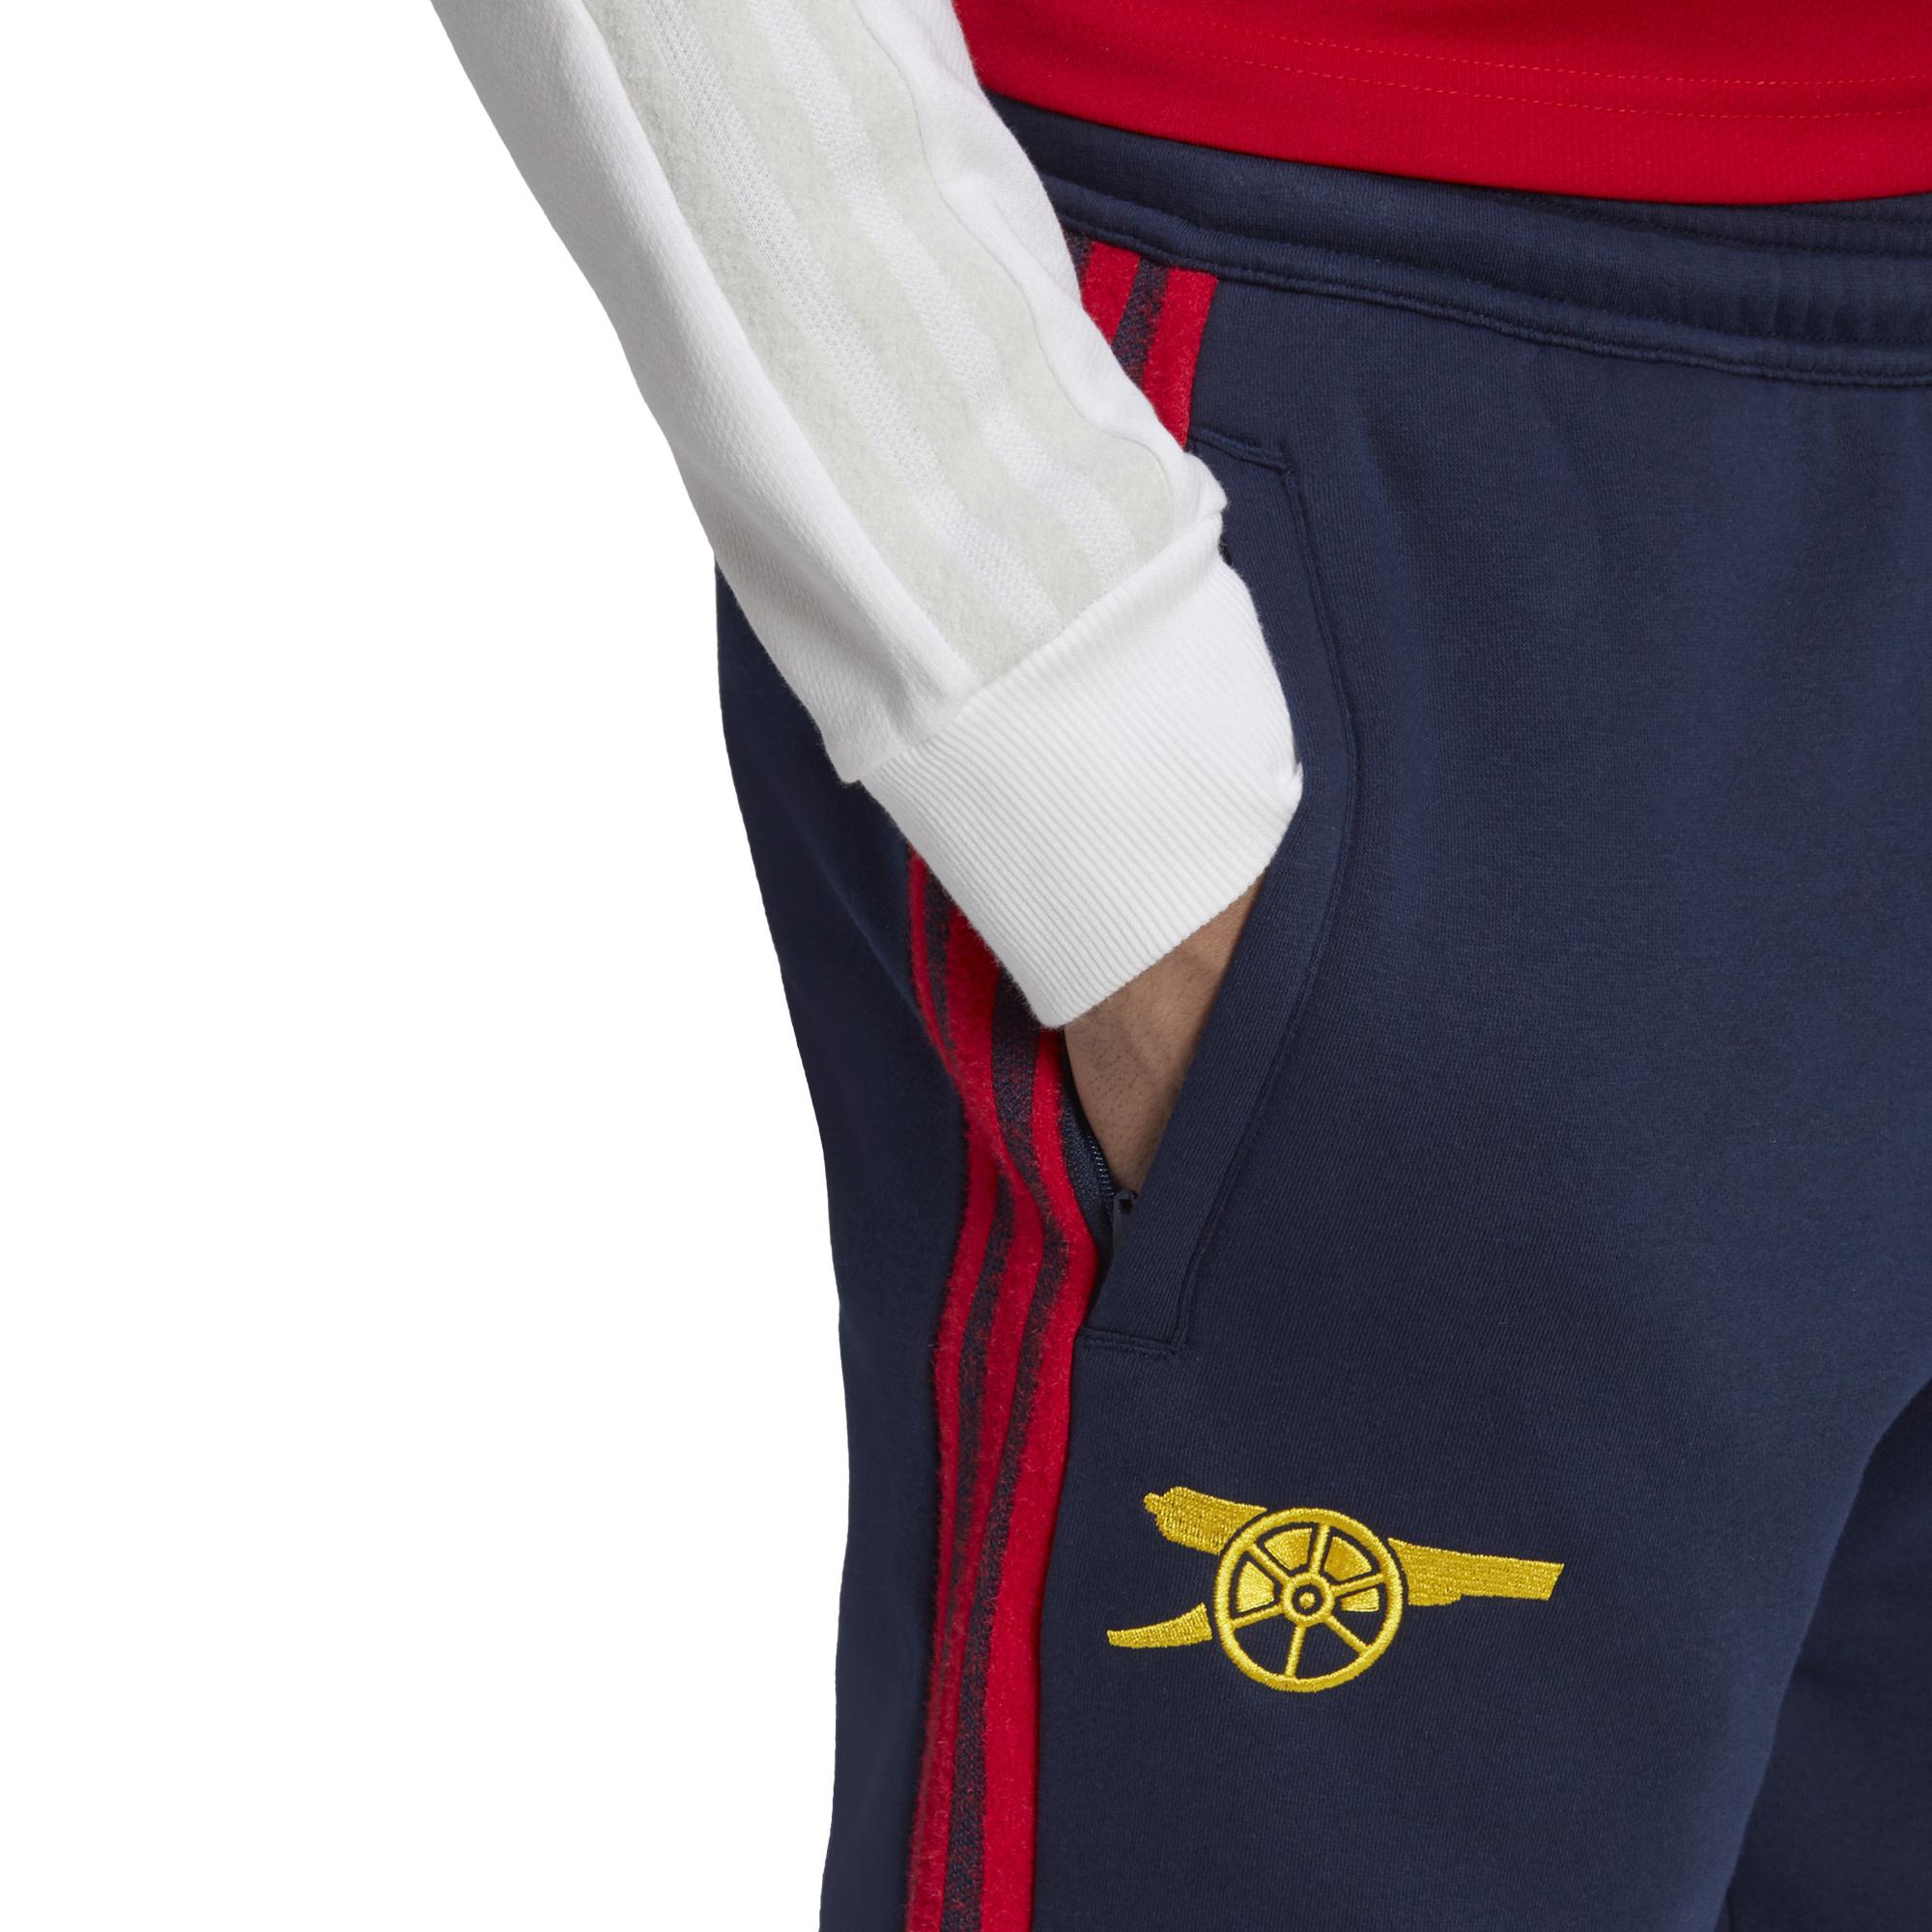 Adidas ADIDAS Arsenal Icons Pant